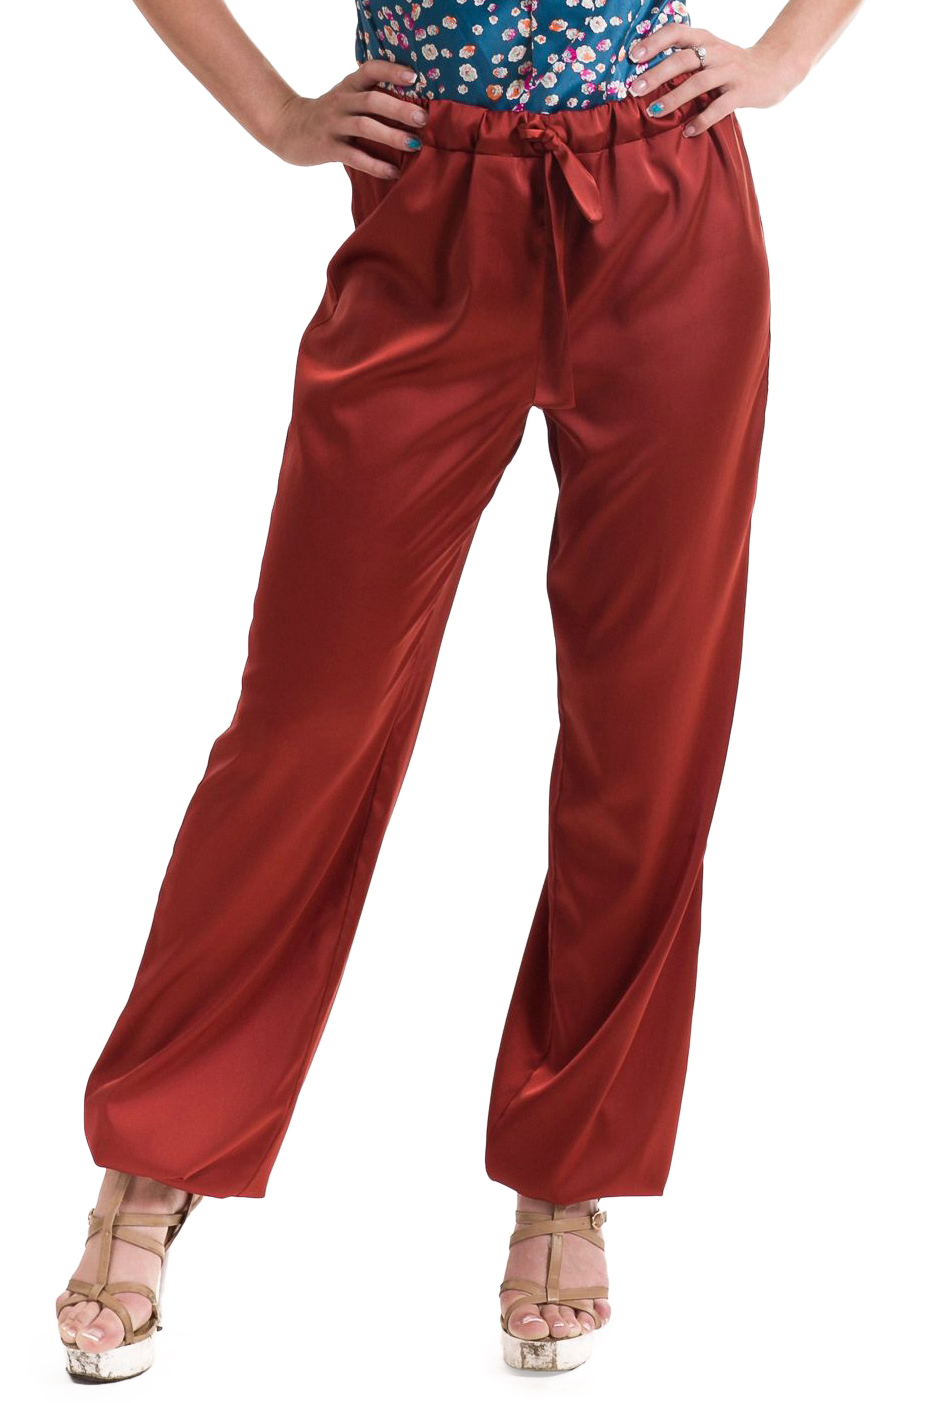 Брюки женские брюки лэйт светлый размер 50